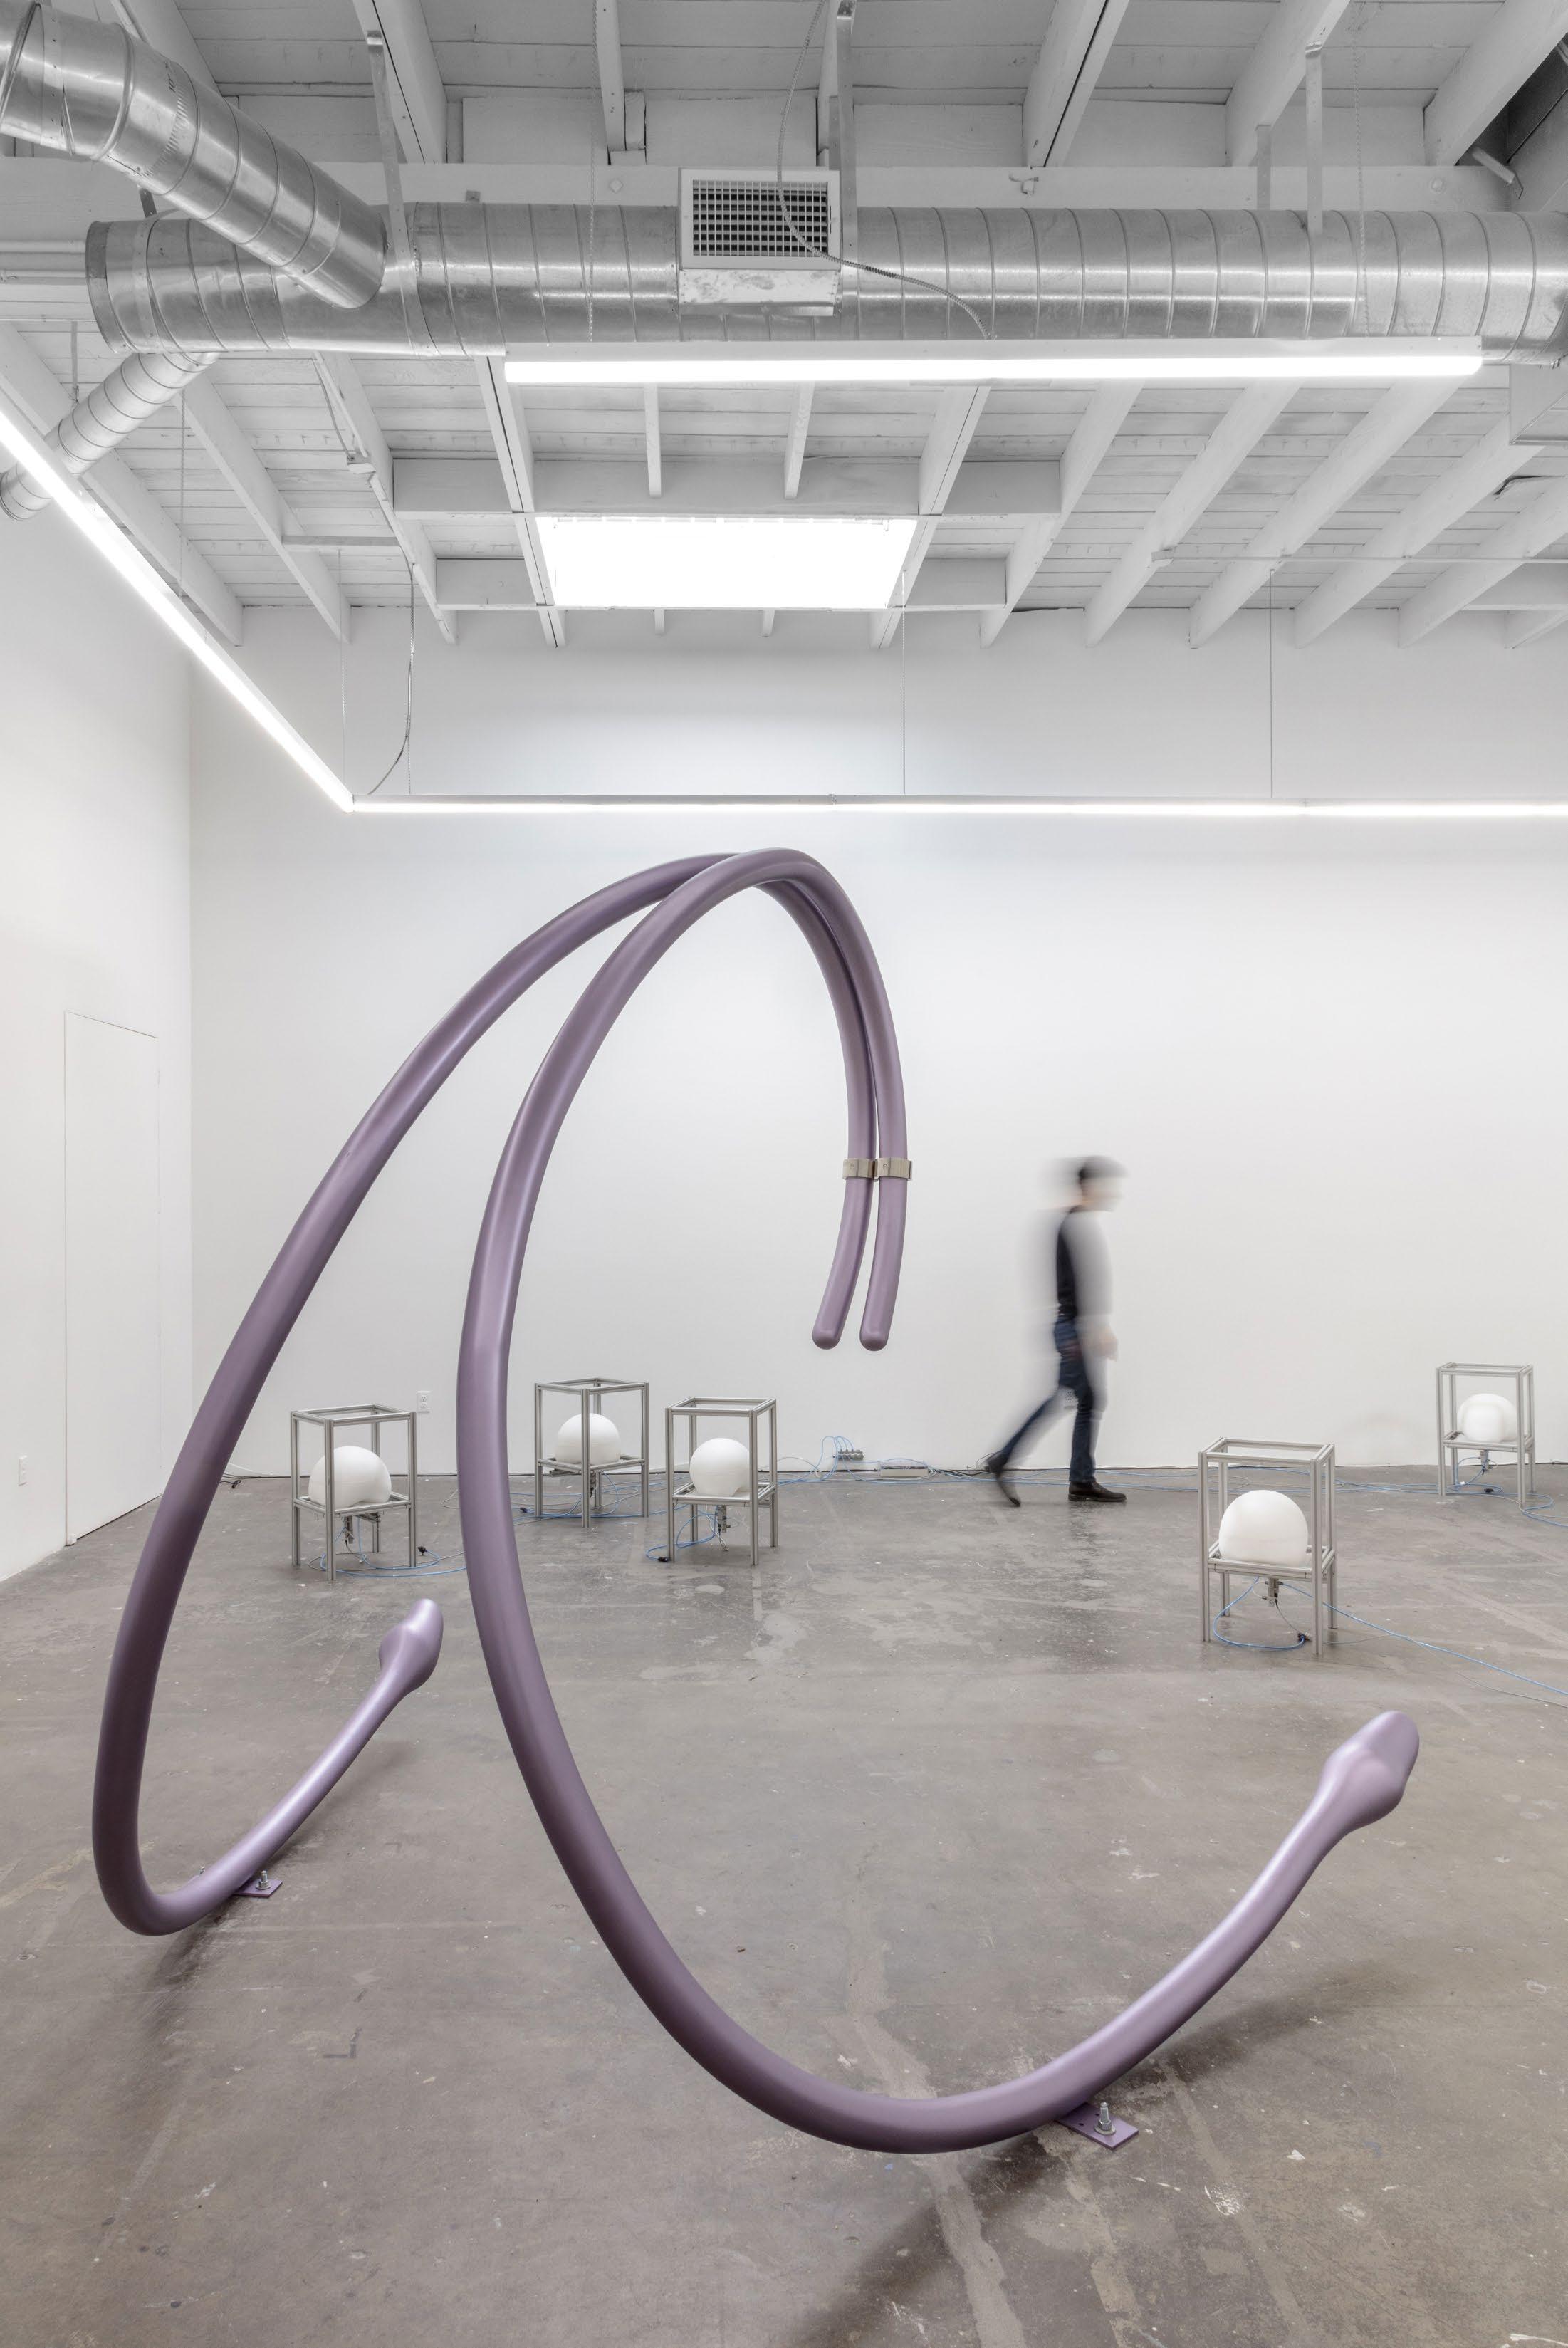 Harrison Pearce, Maladapted at Baert Gallery, Los Angeles USA, 2019